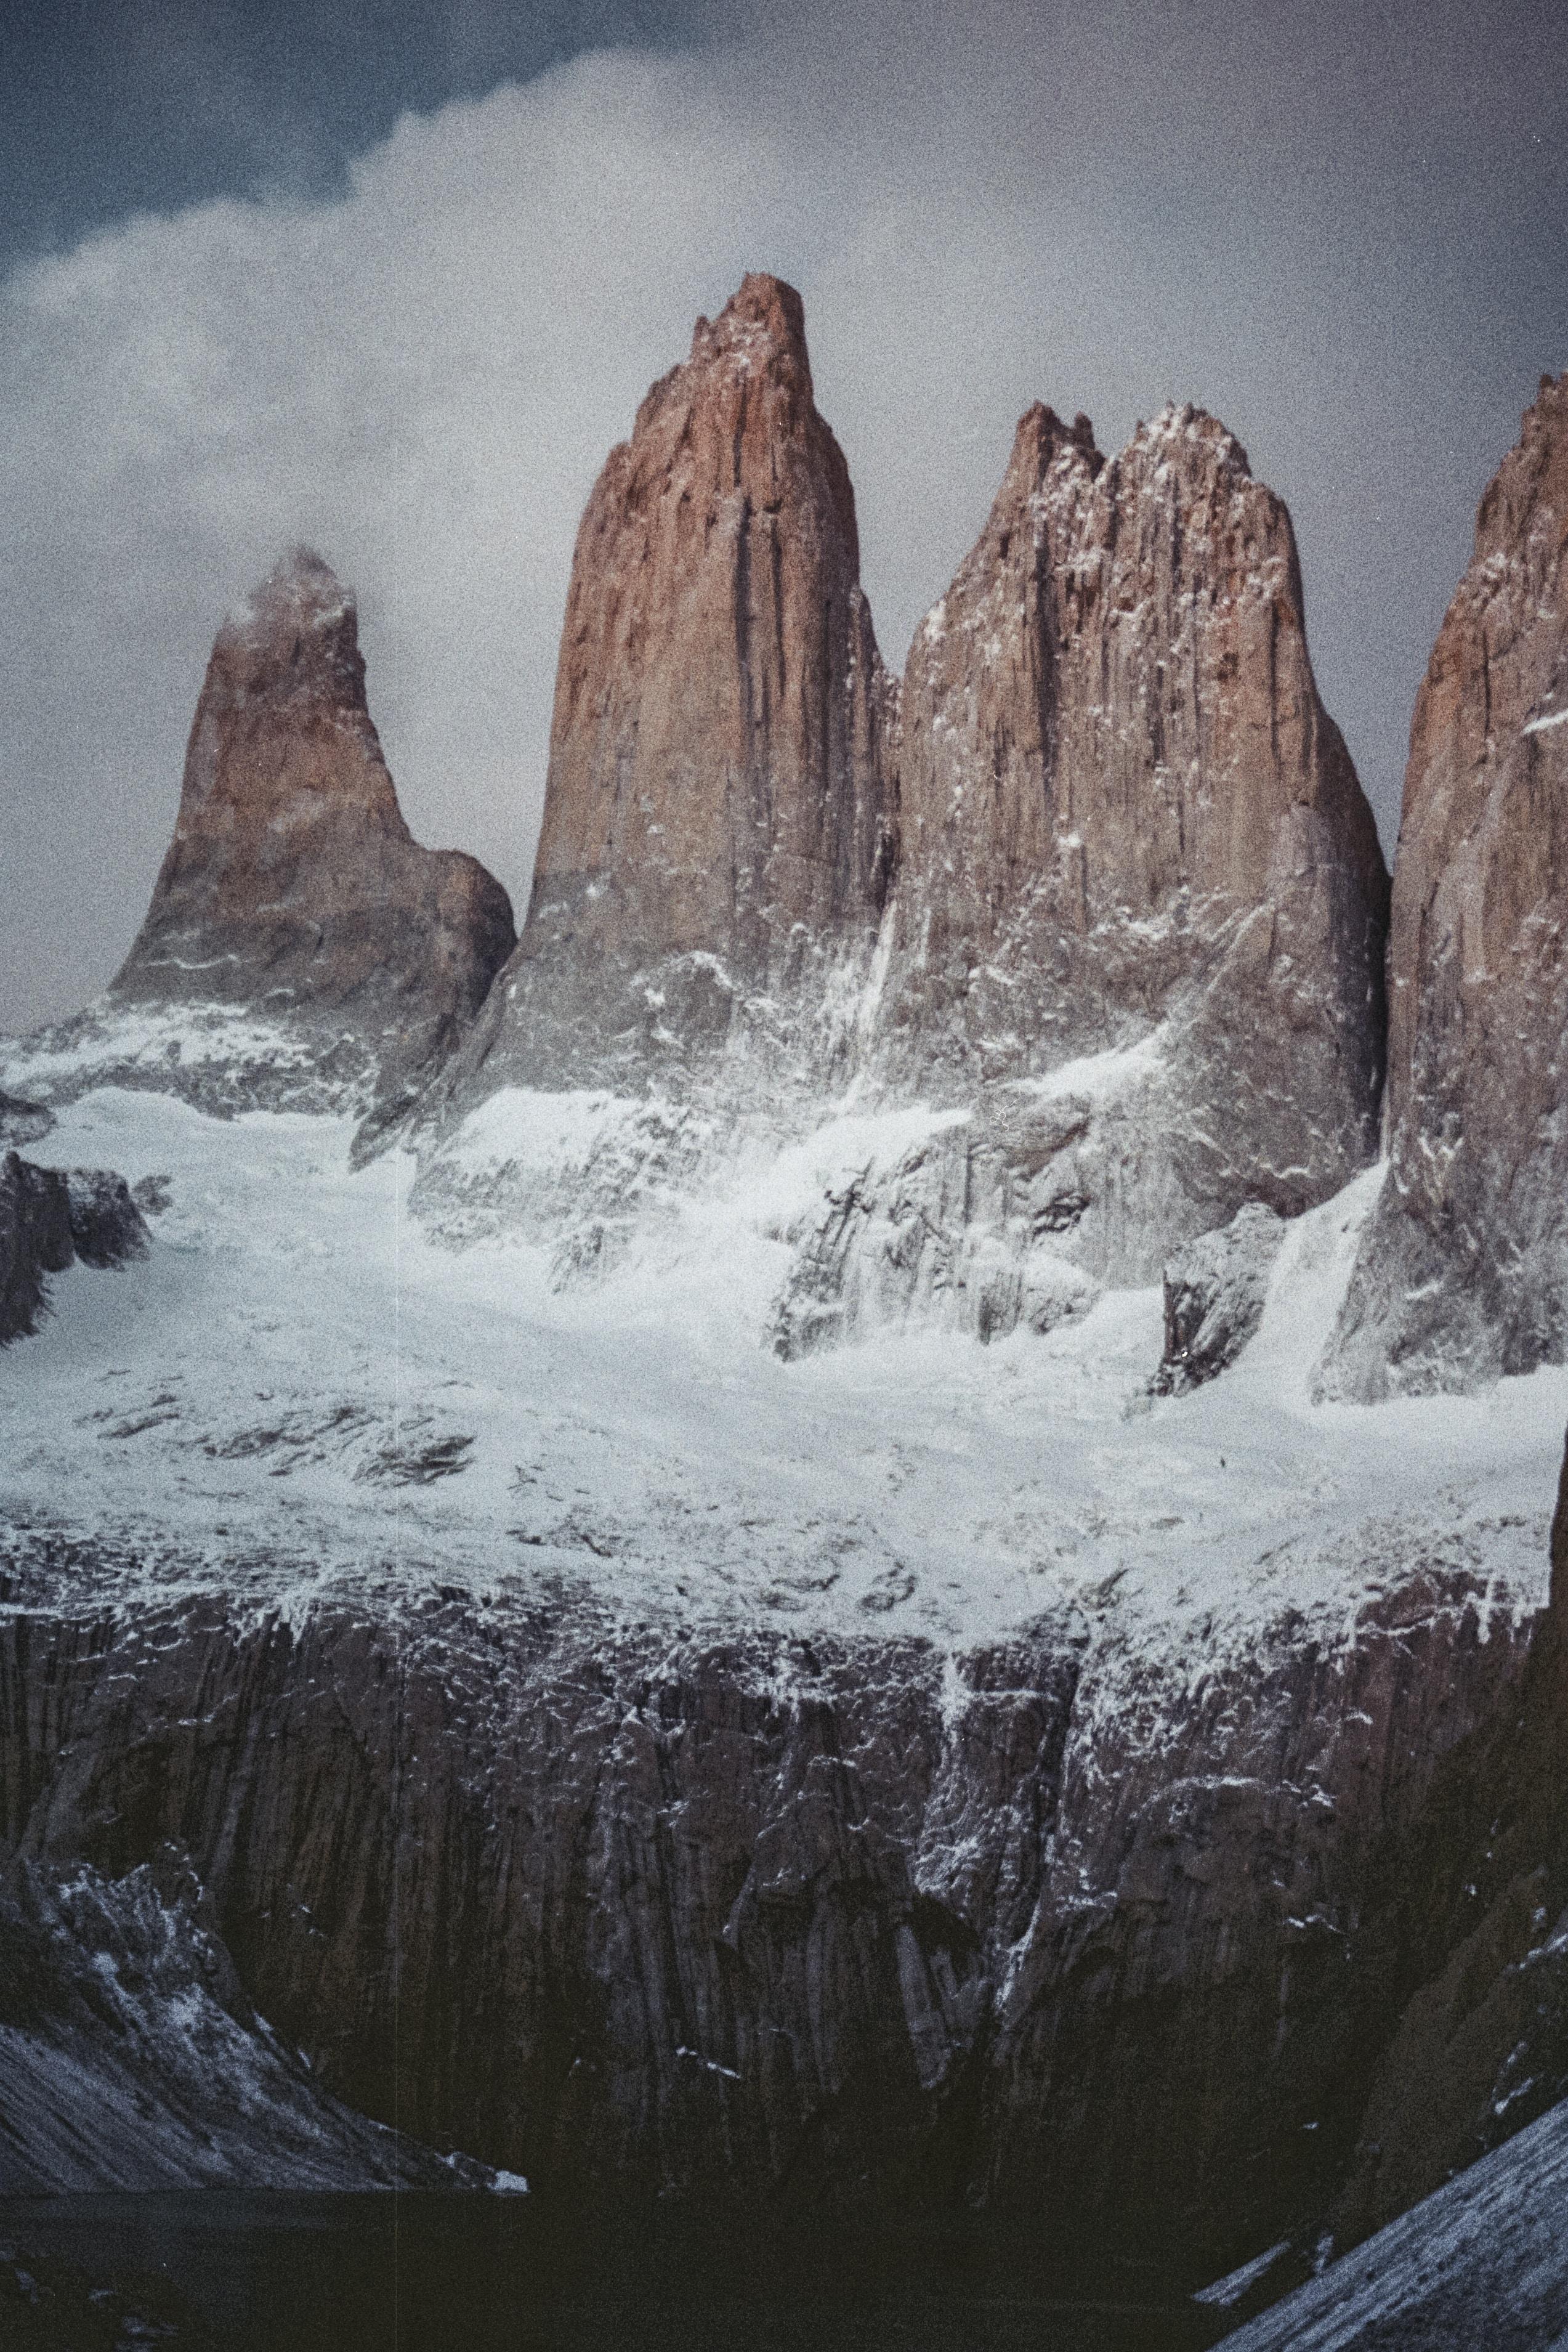 high-angle photography of brown mountains